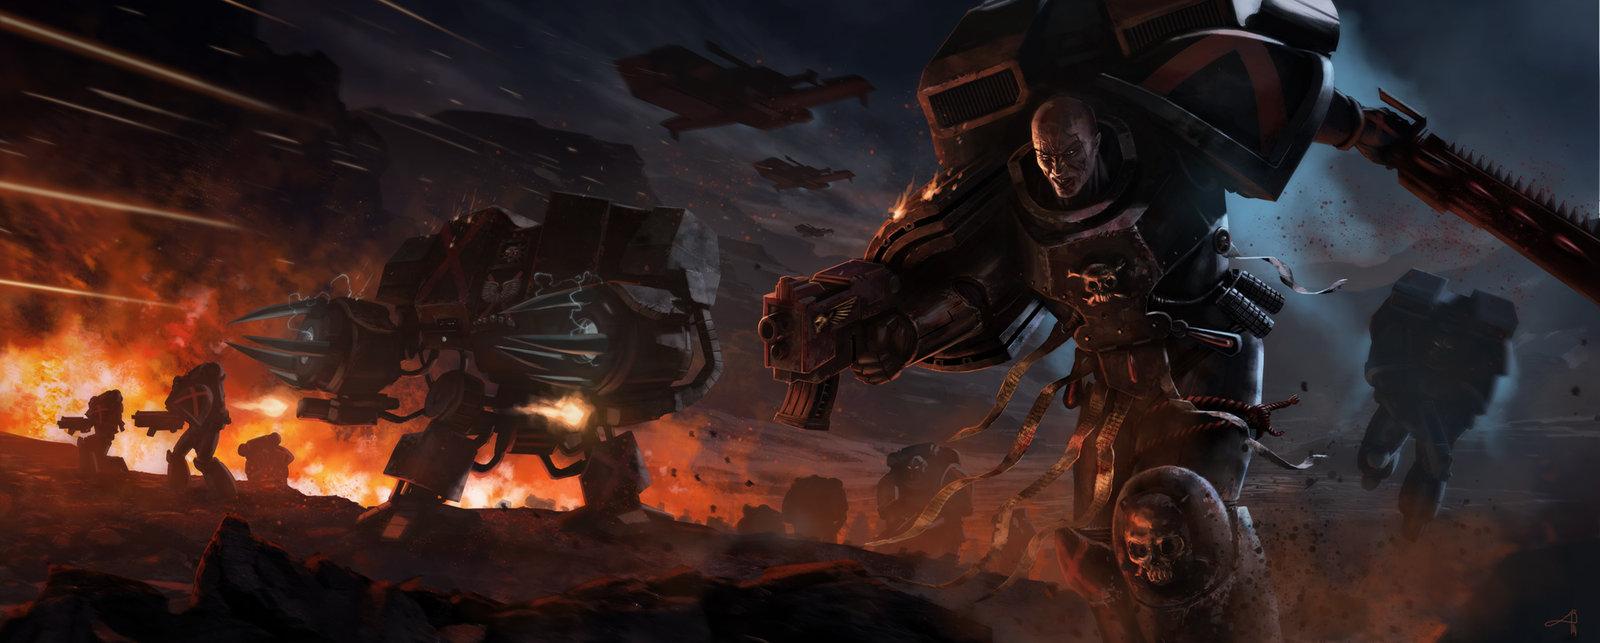 Warhammer 40k Death Company Blood Angels Tribute by pierreloyvet on 1600x643